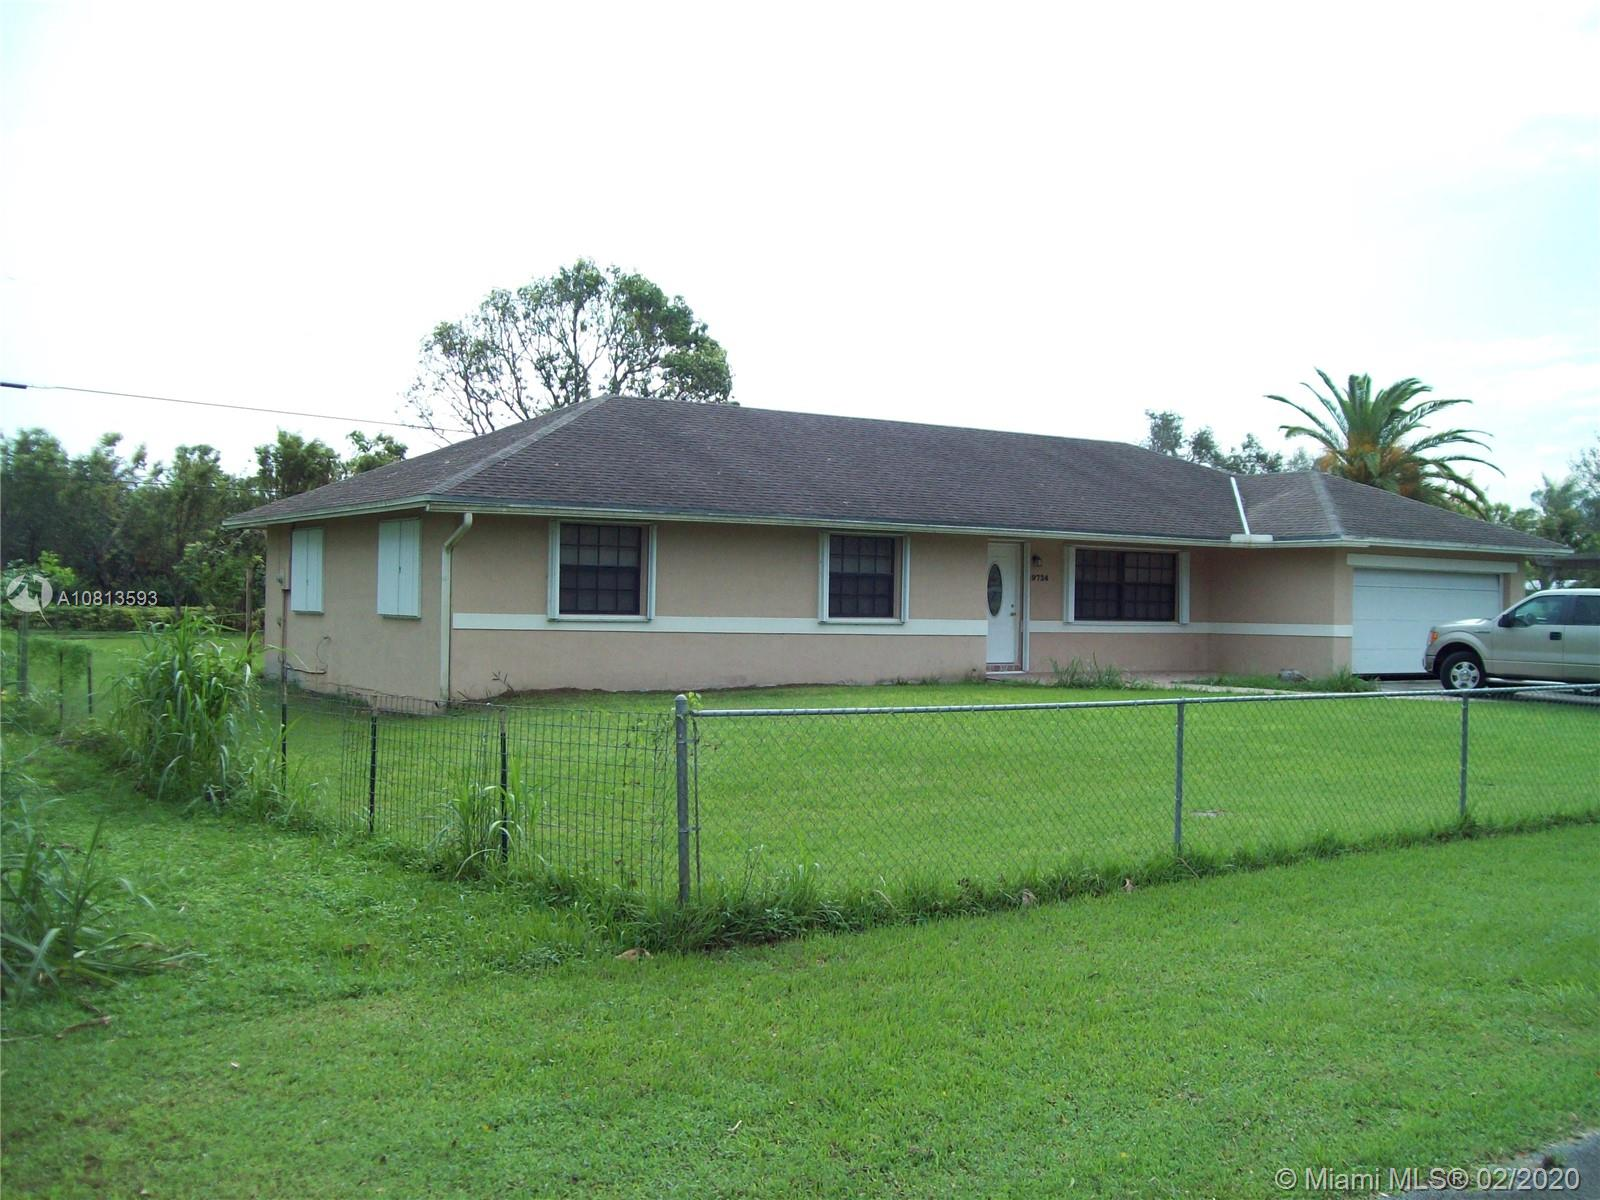 19724 SW 243rd Ter, Homestead, FL 33031 - Homestead, FL real estate listing